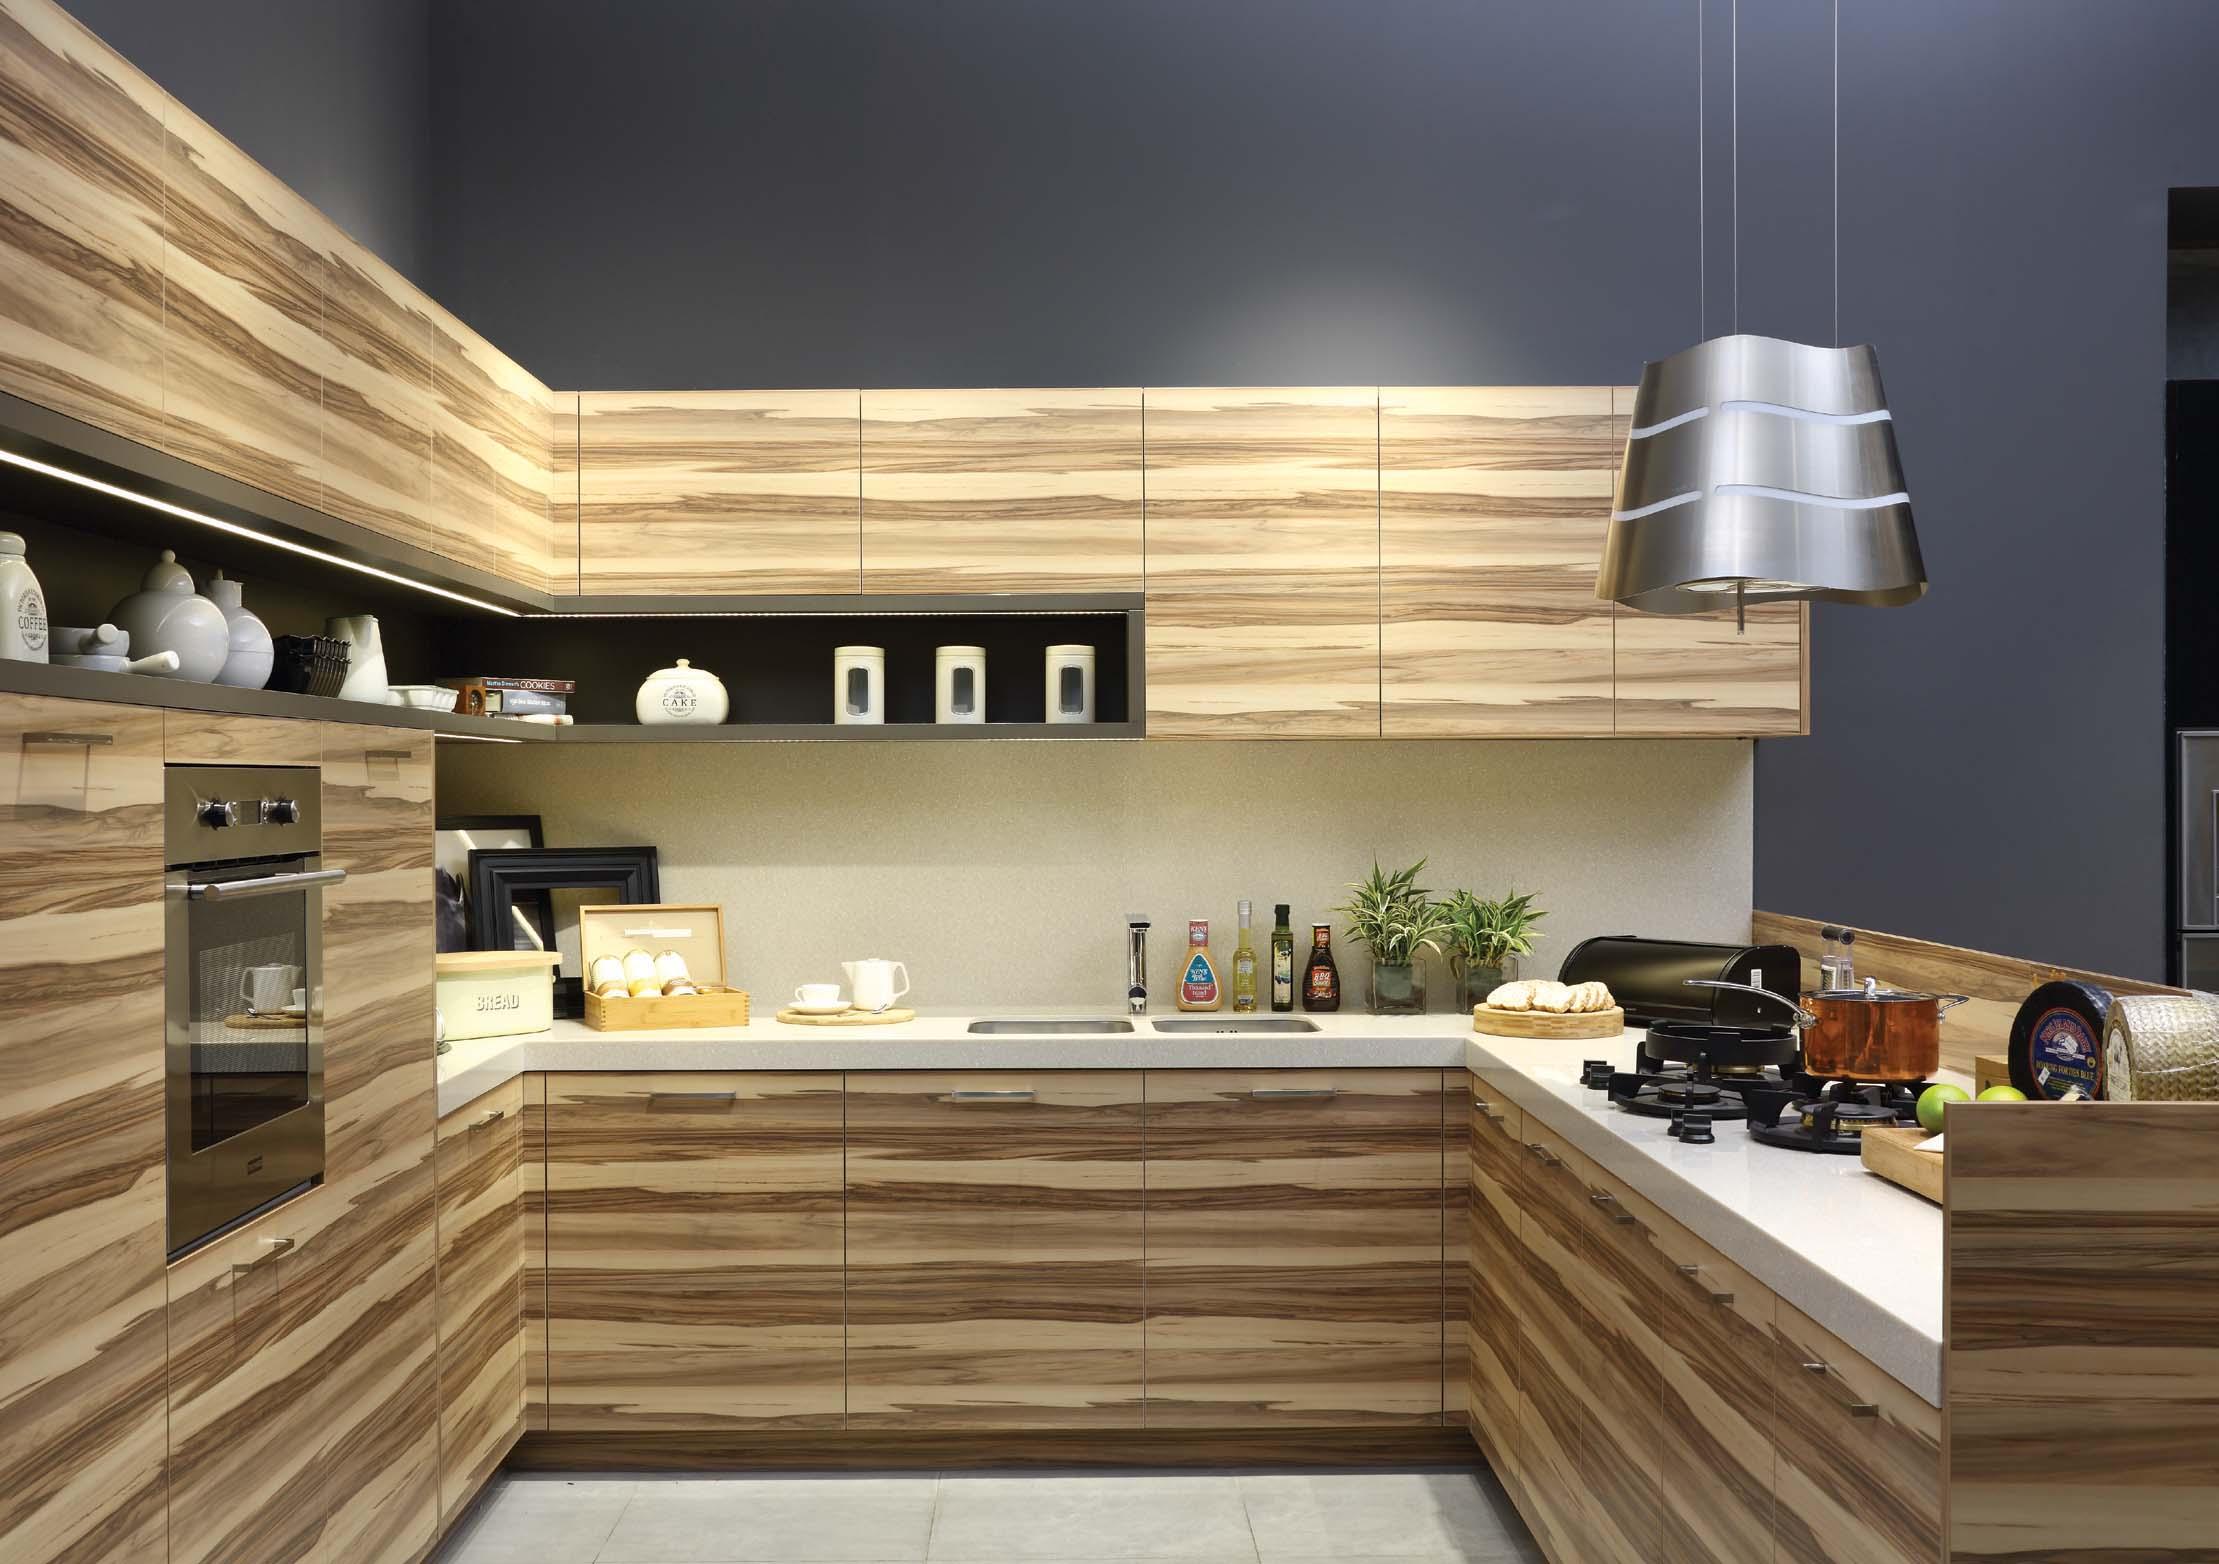 Fungsi dan Estetika Tinggi Produk TOTO Kitchen Untuk Dapur Anda